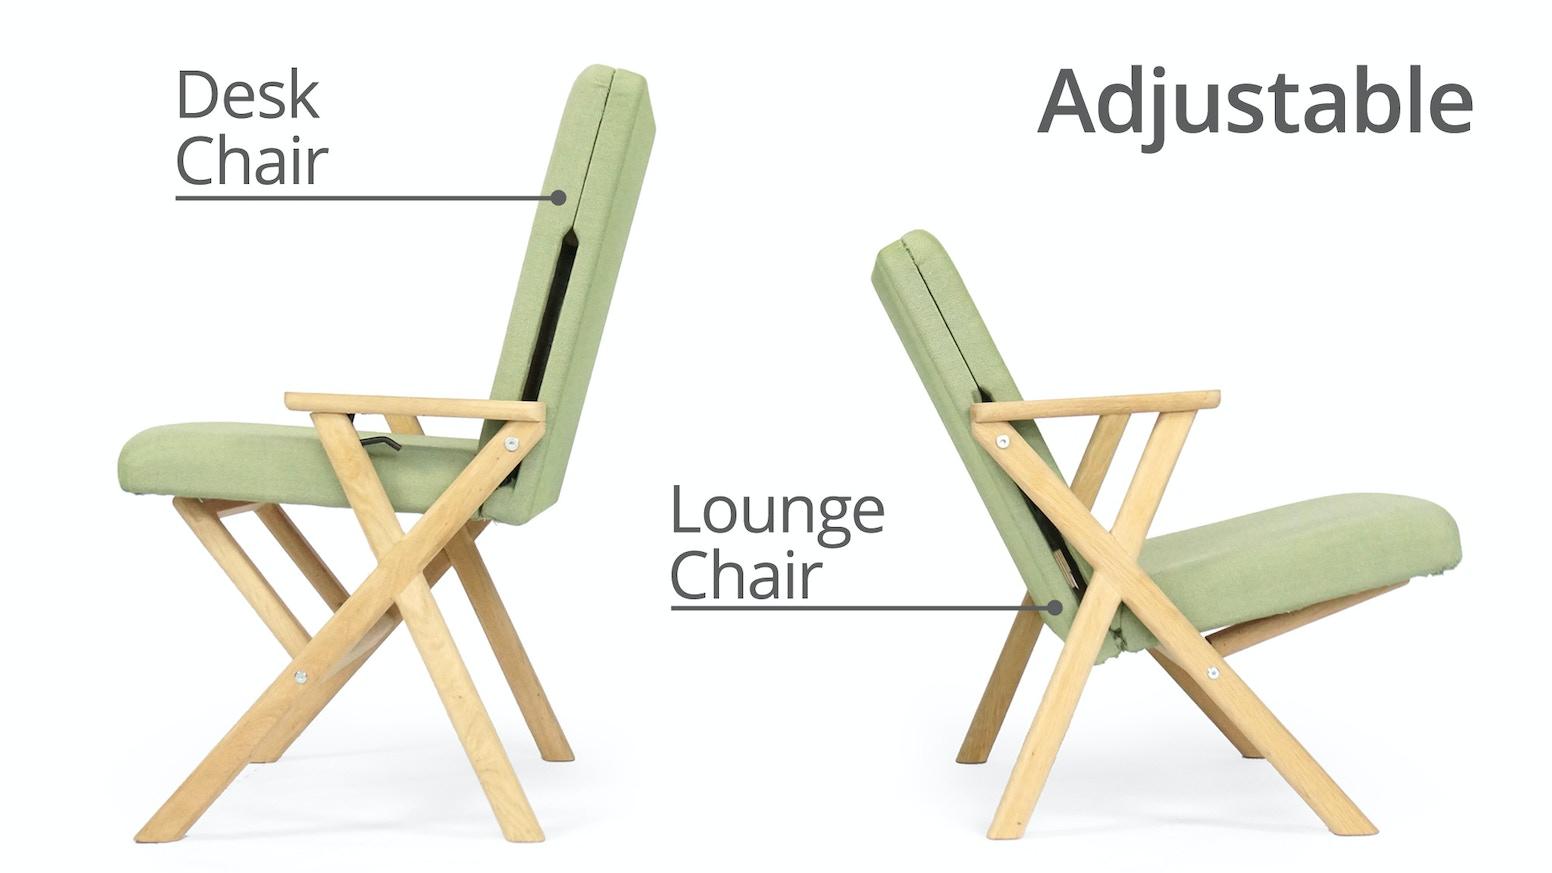 Hybrid Chair Lounger That Transforms